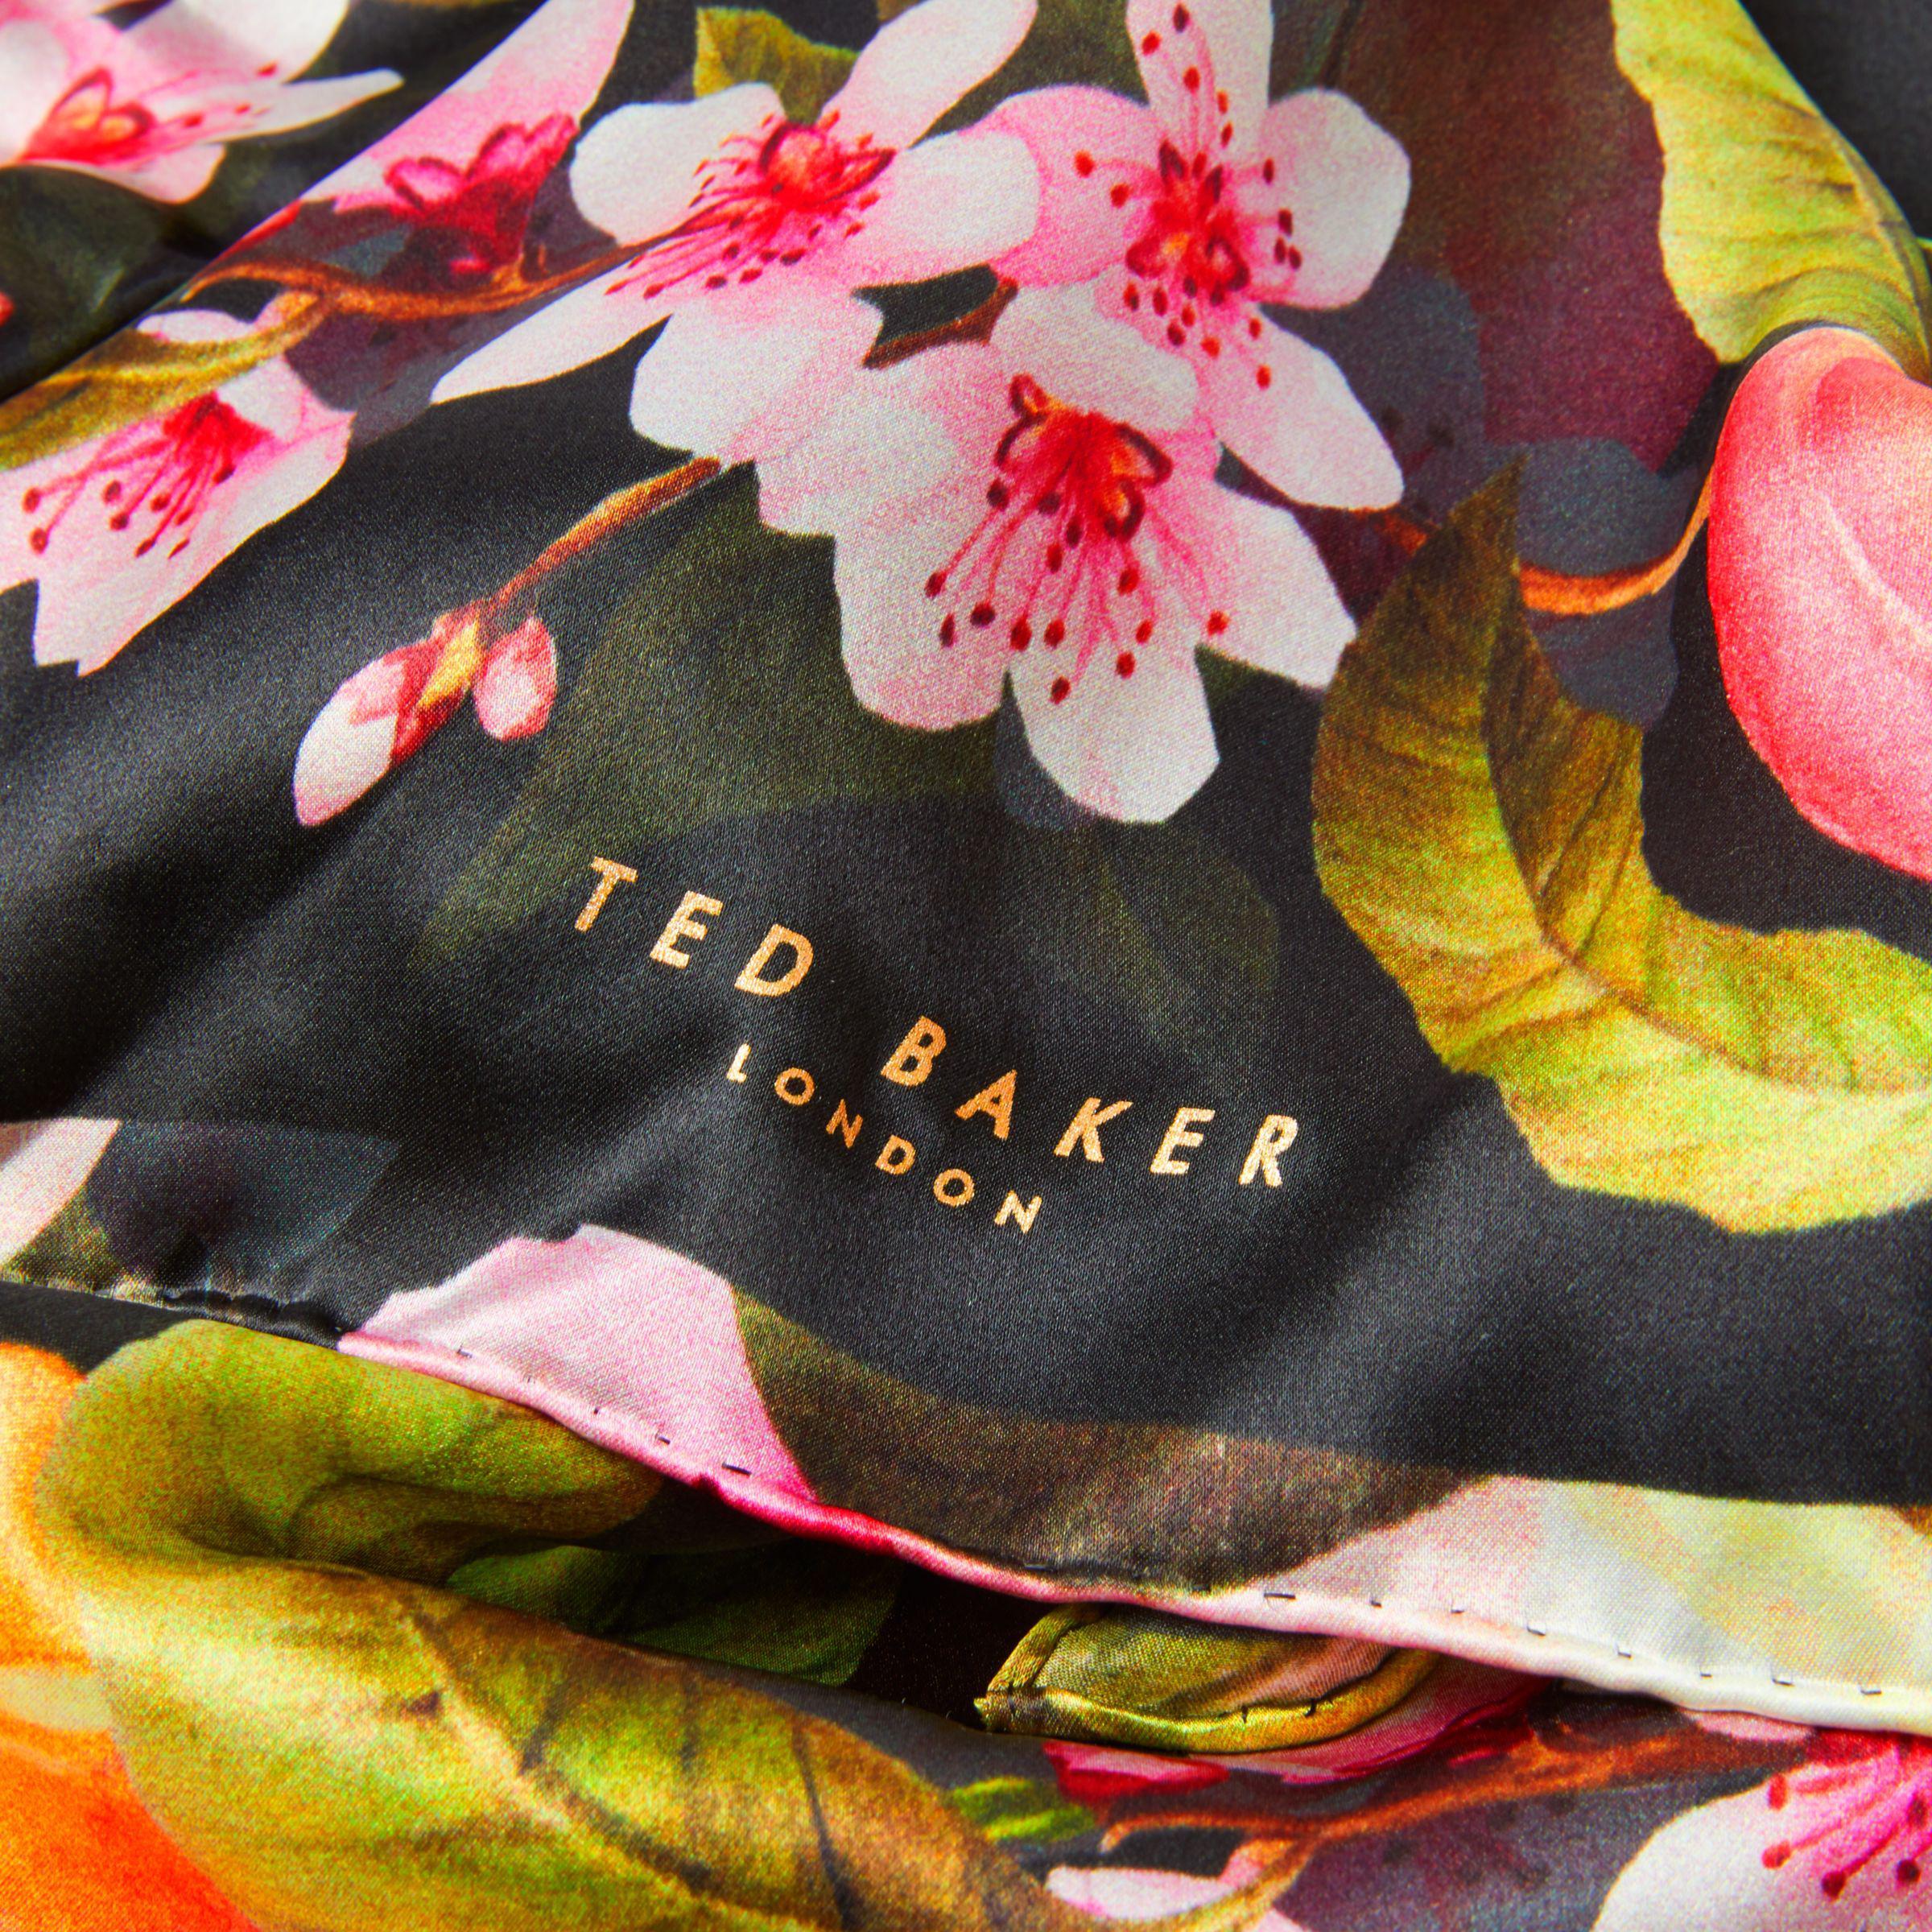 John lewis ted baker primula peach blossom silk scarf in black lyst gallery mightylinksfo